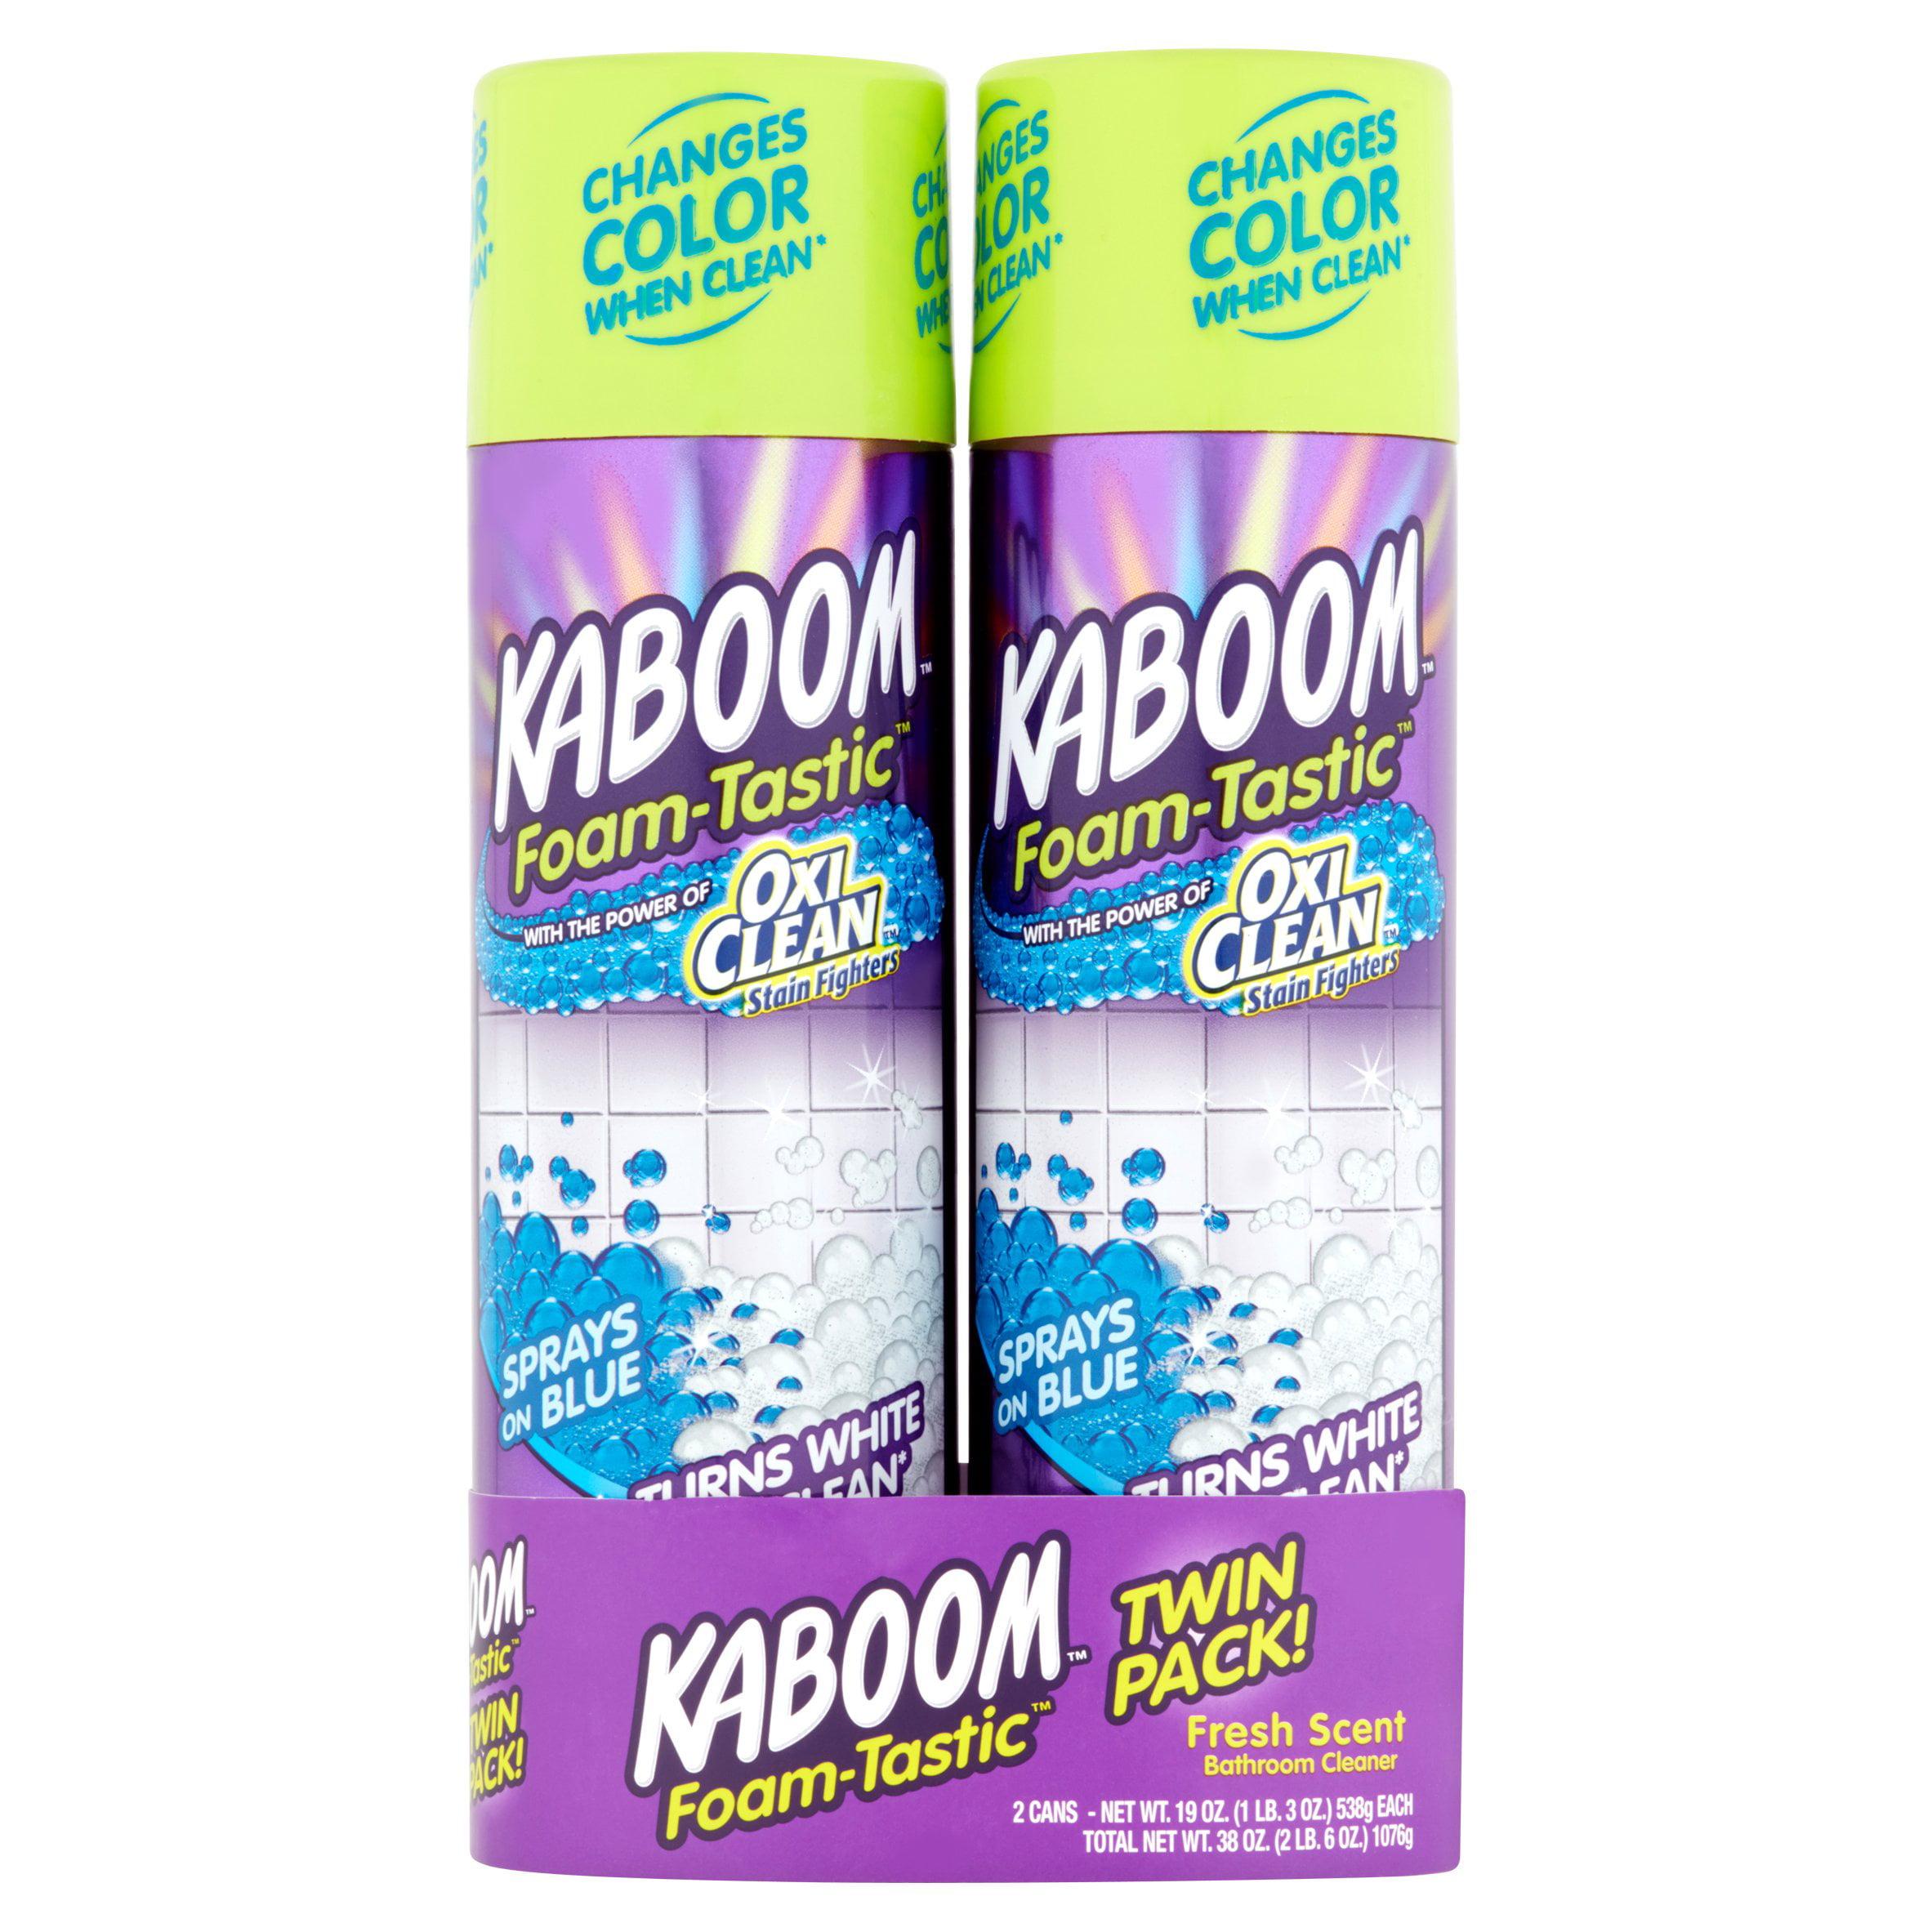 Kaboom Foam-Tastic Fresh Scent Bathroom Cleaner Twin Pack!, 19 oz, 2 count